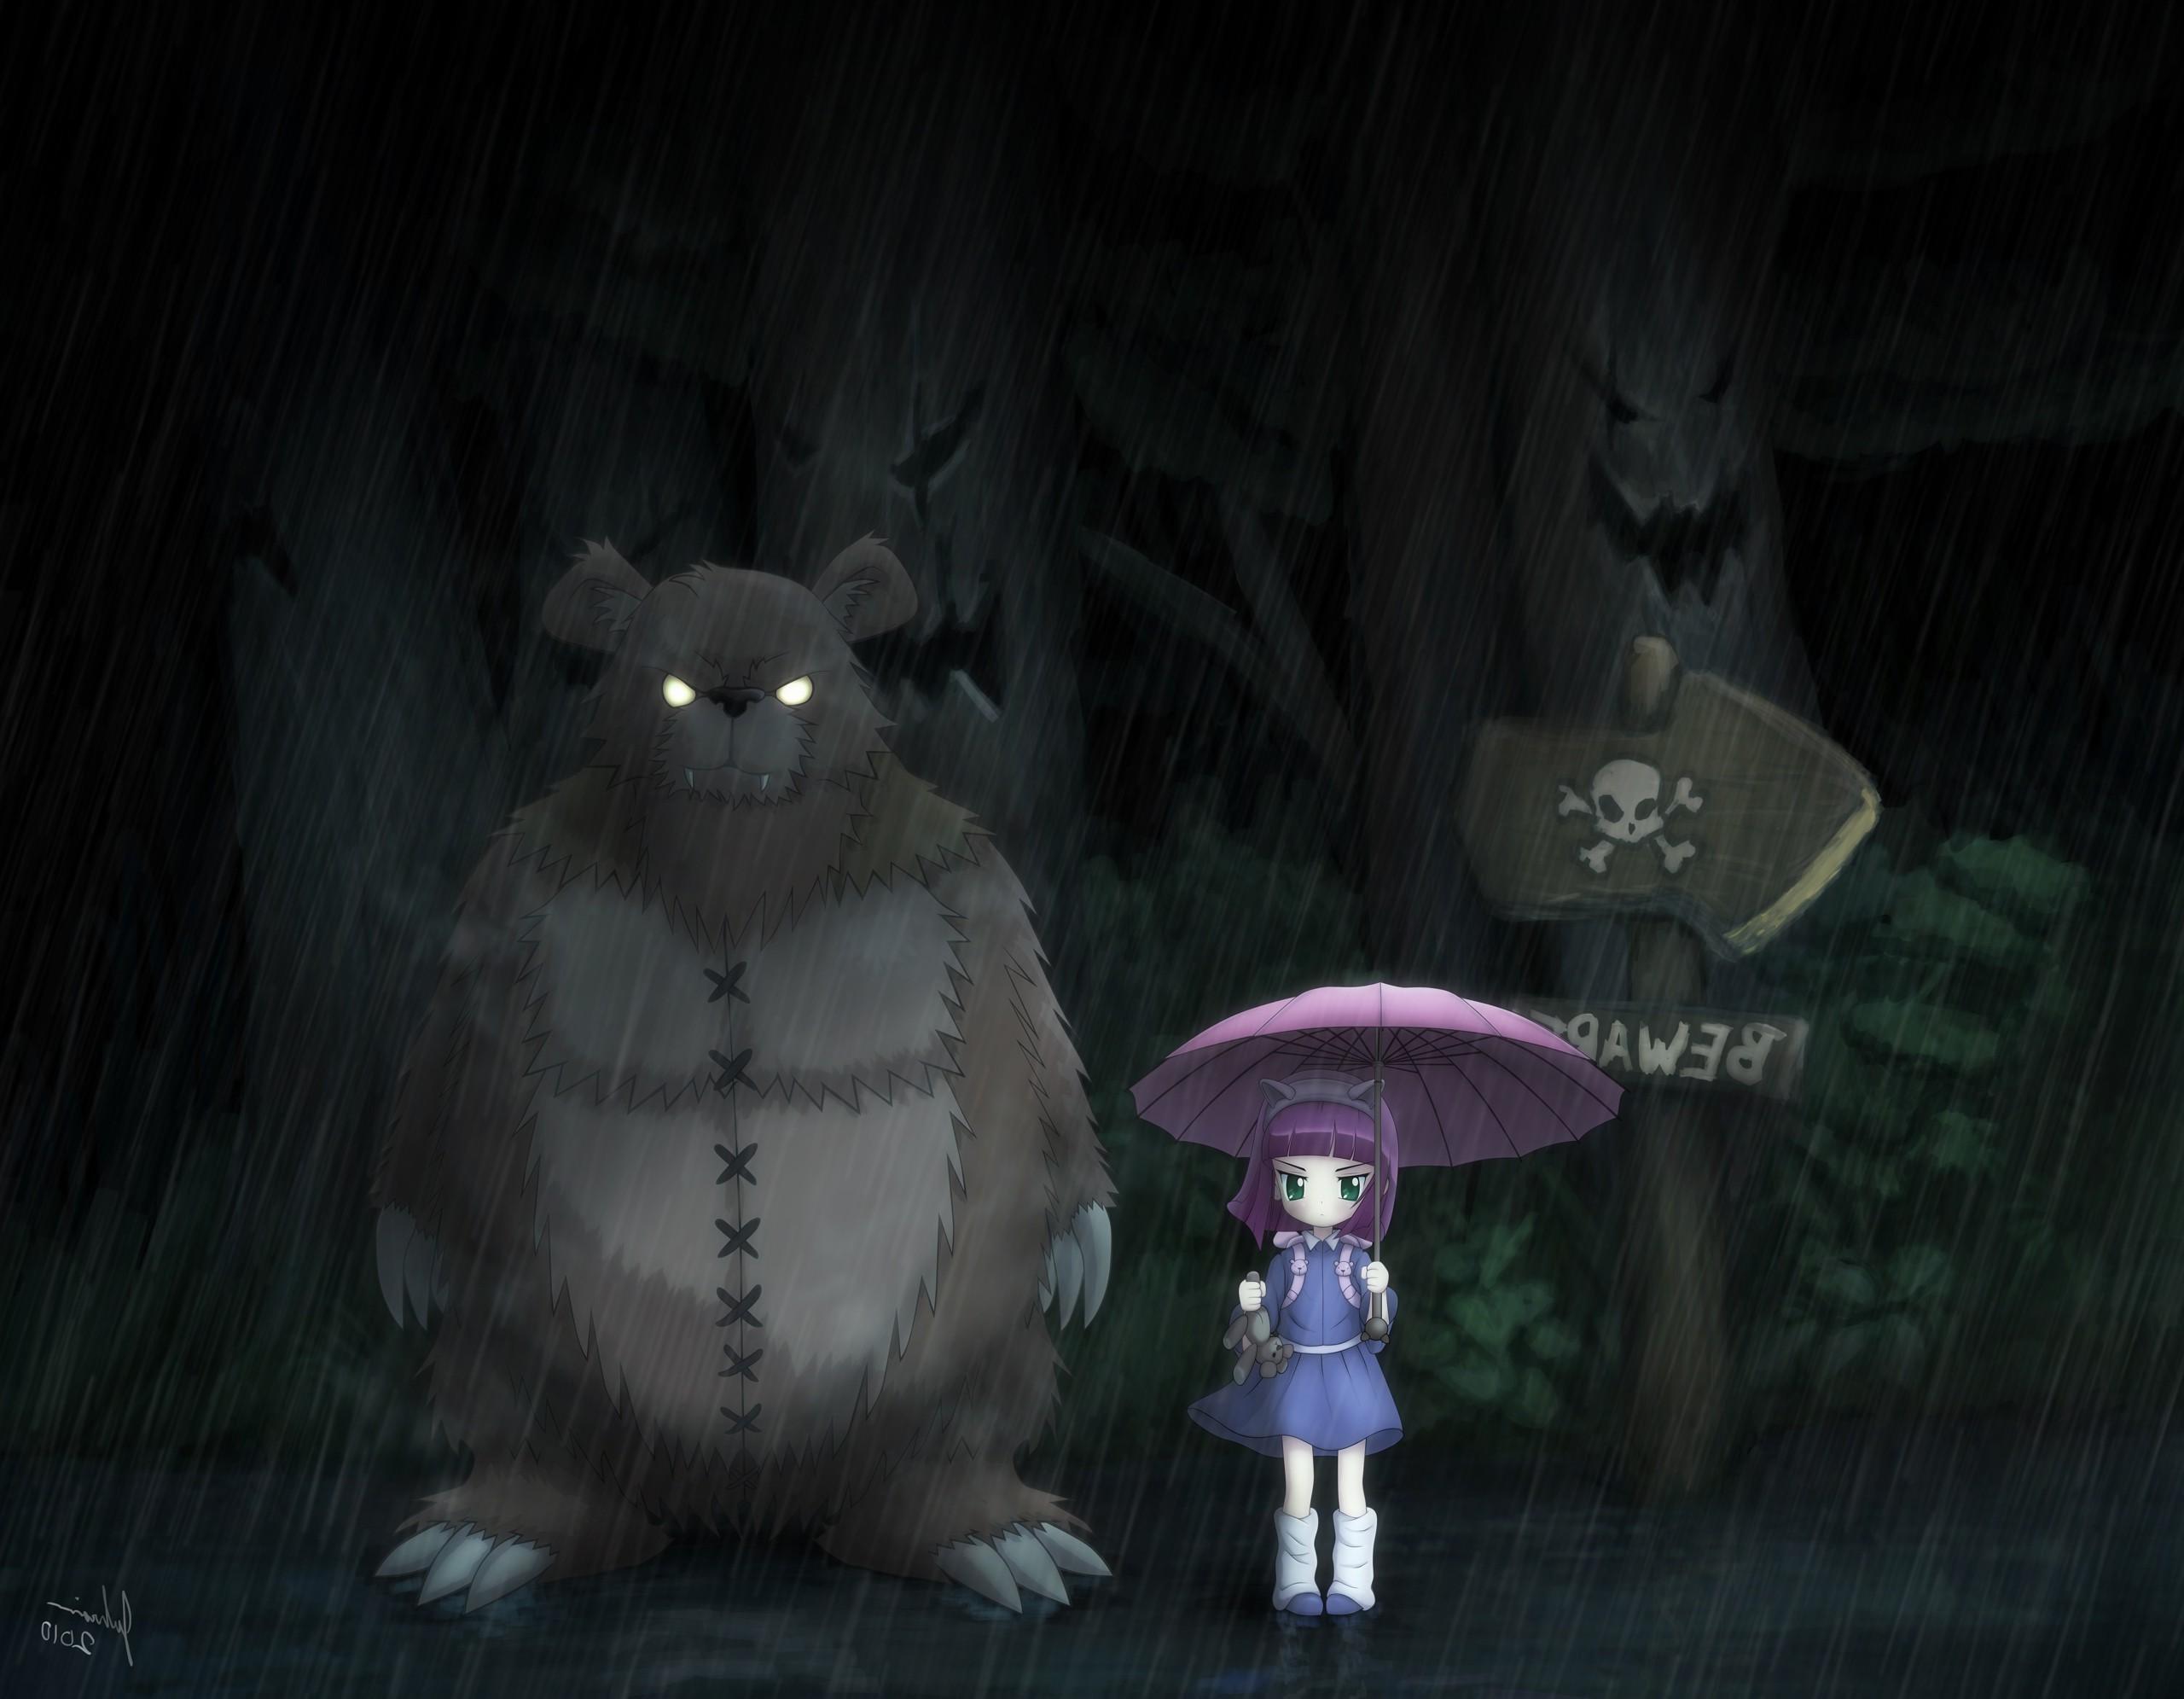 Totoro Wallpaper Hd 65 Pictures